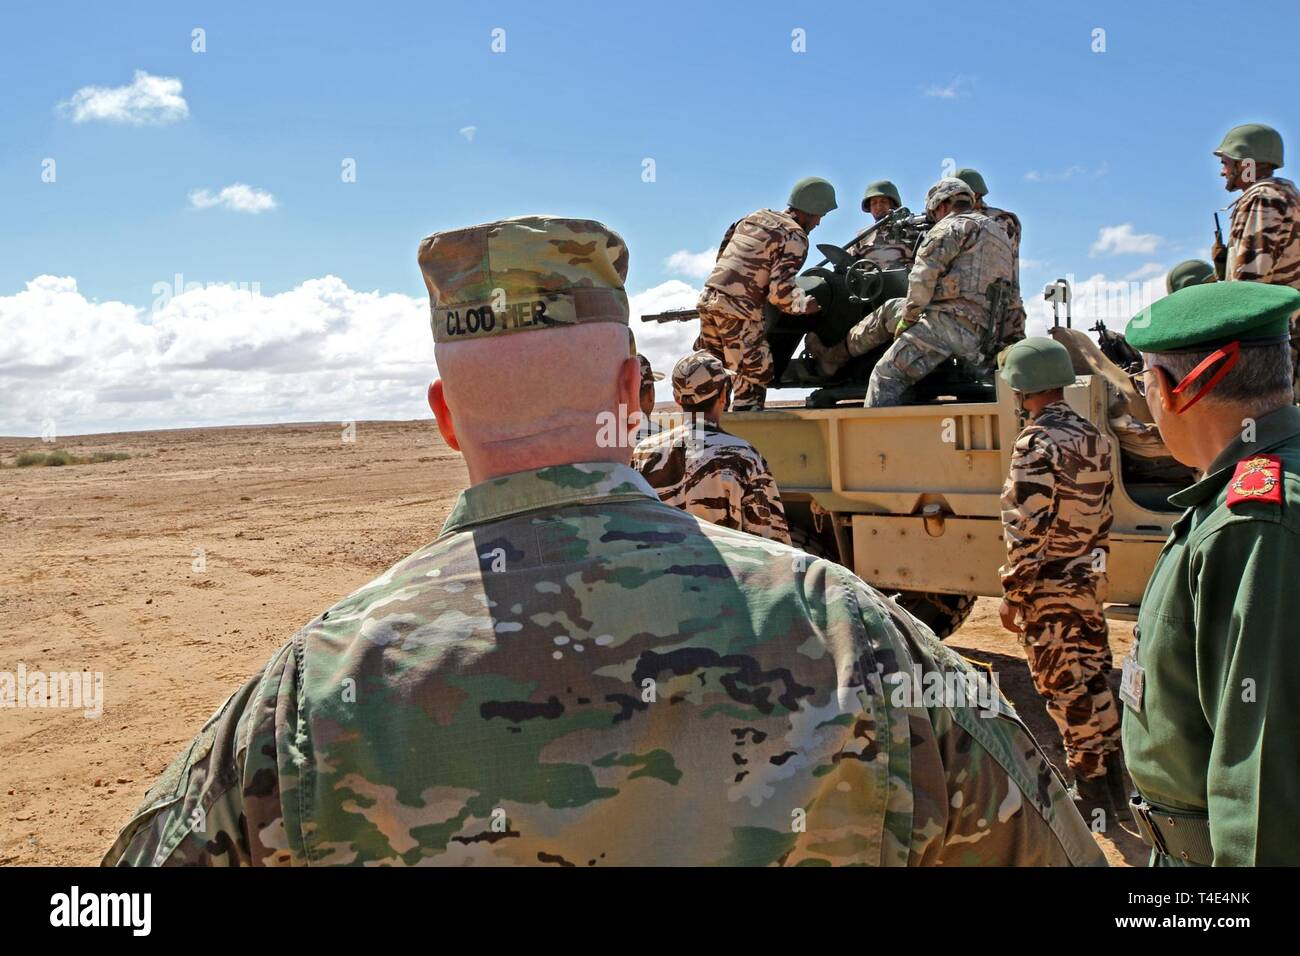 Britische Armee Kombinierte Operations Schulter Titel Blitze WW2 Uniform